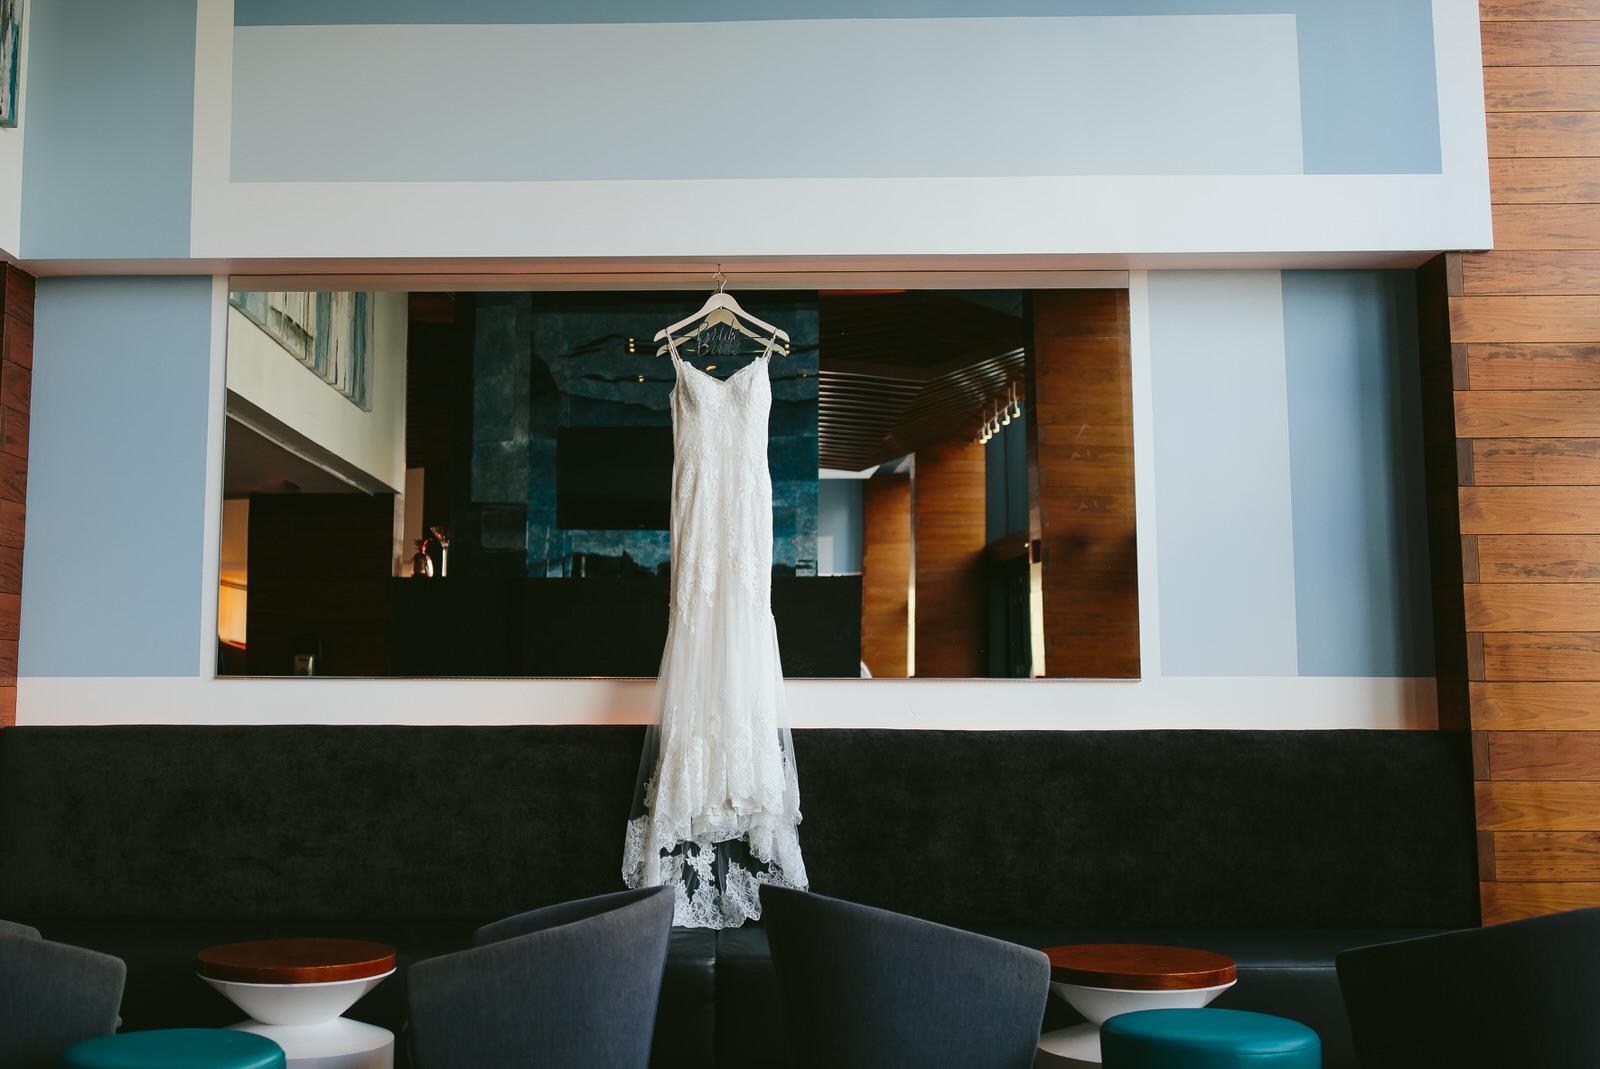 wedding_dress_watergate_hotel_boca_tiny_house_photo.jpg